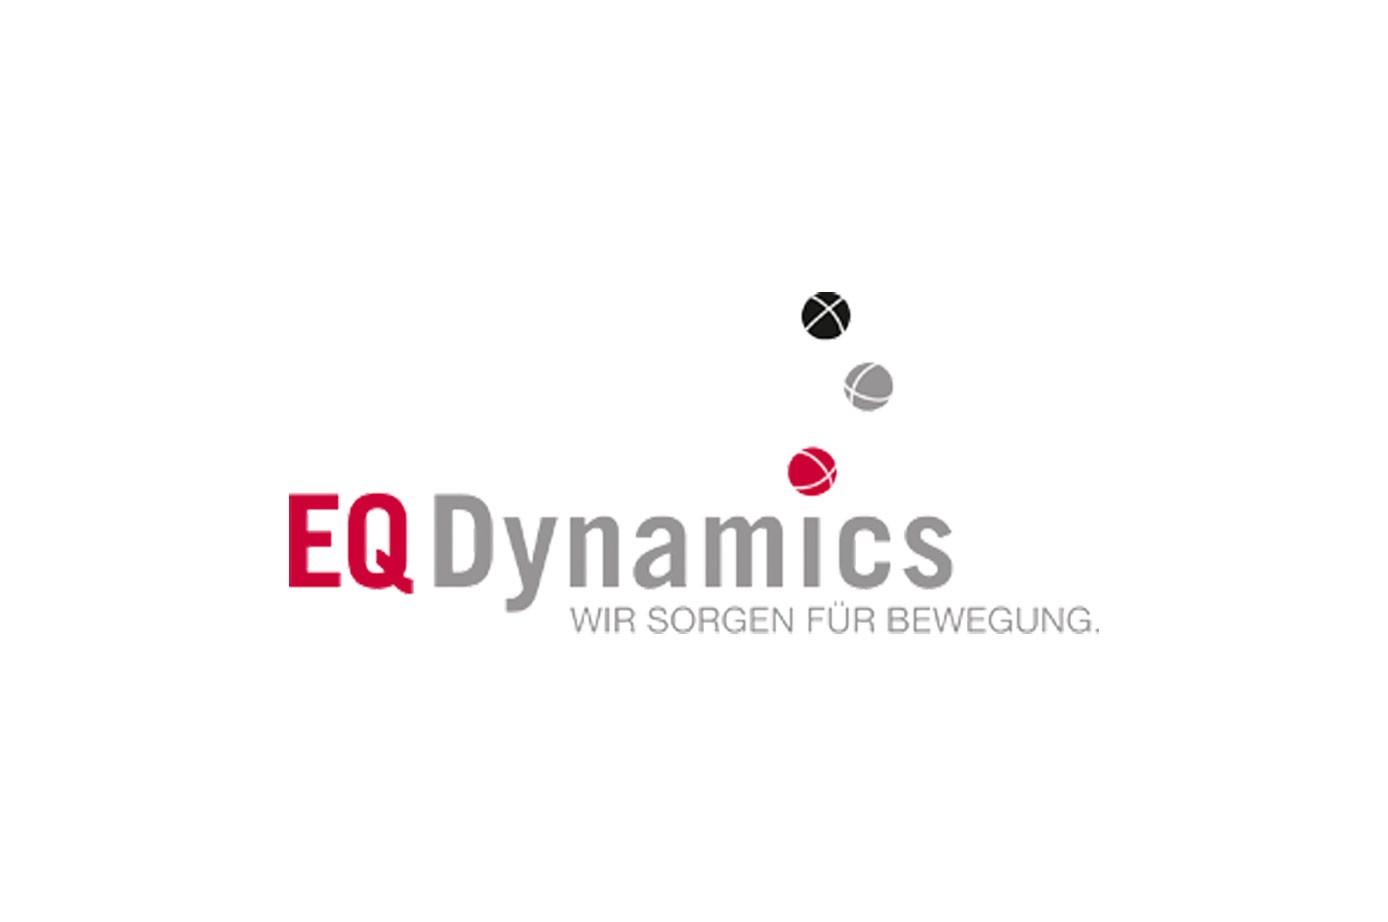 logo-eqdynamics